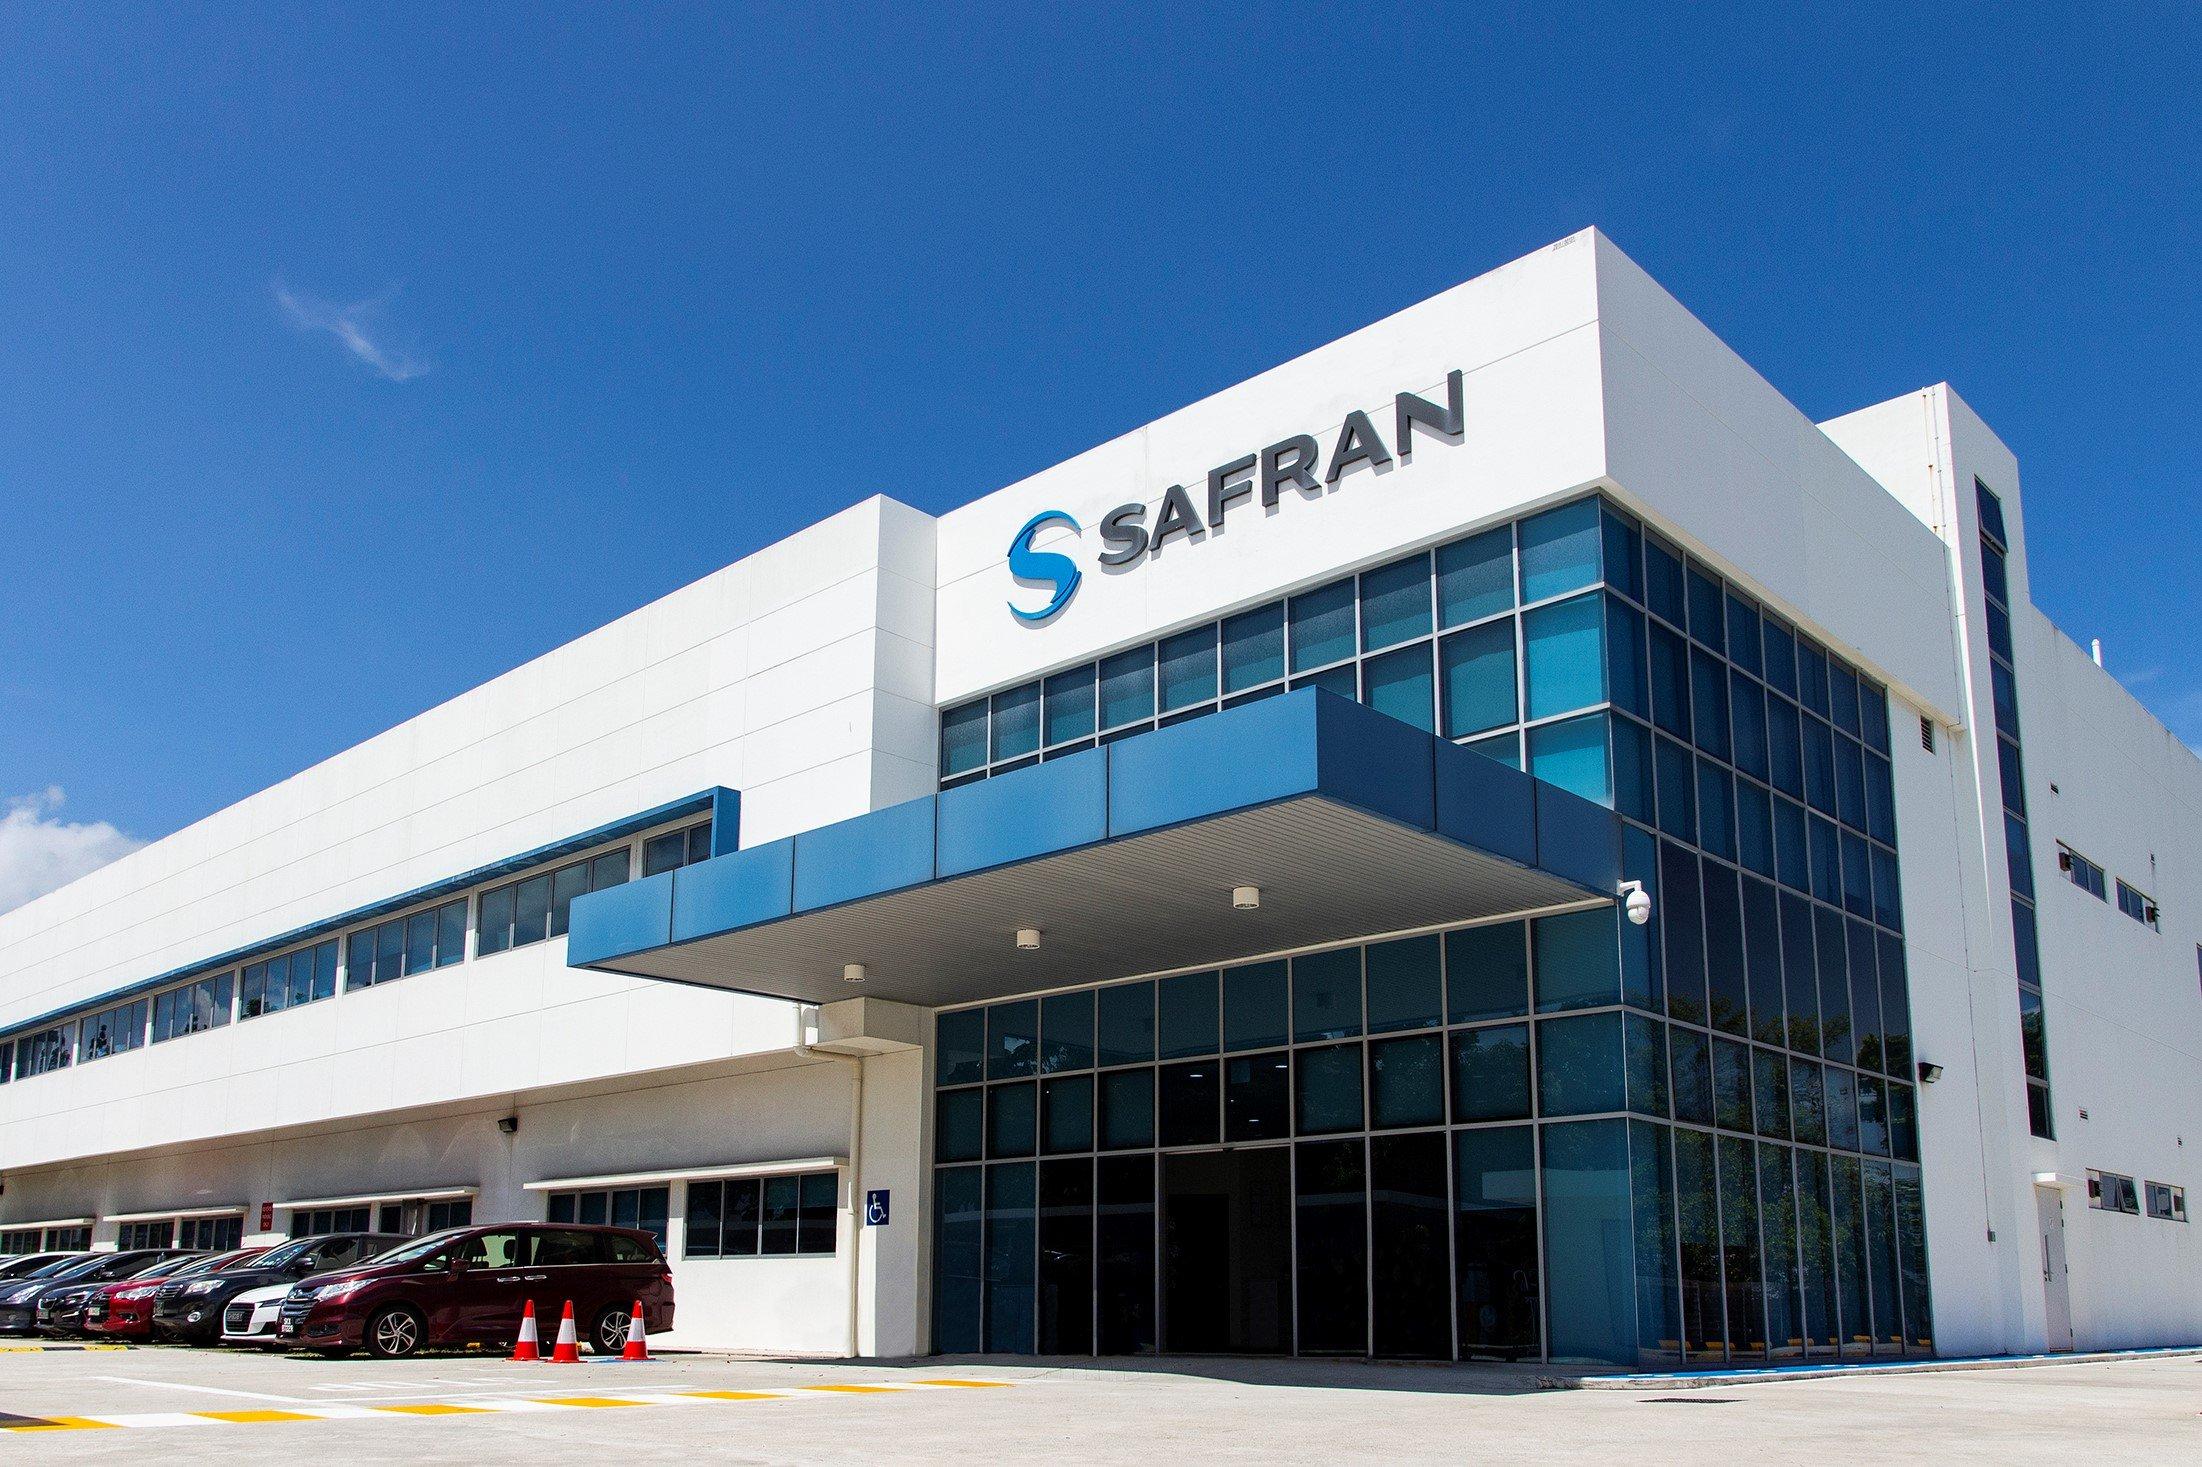 Safran Building